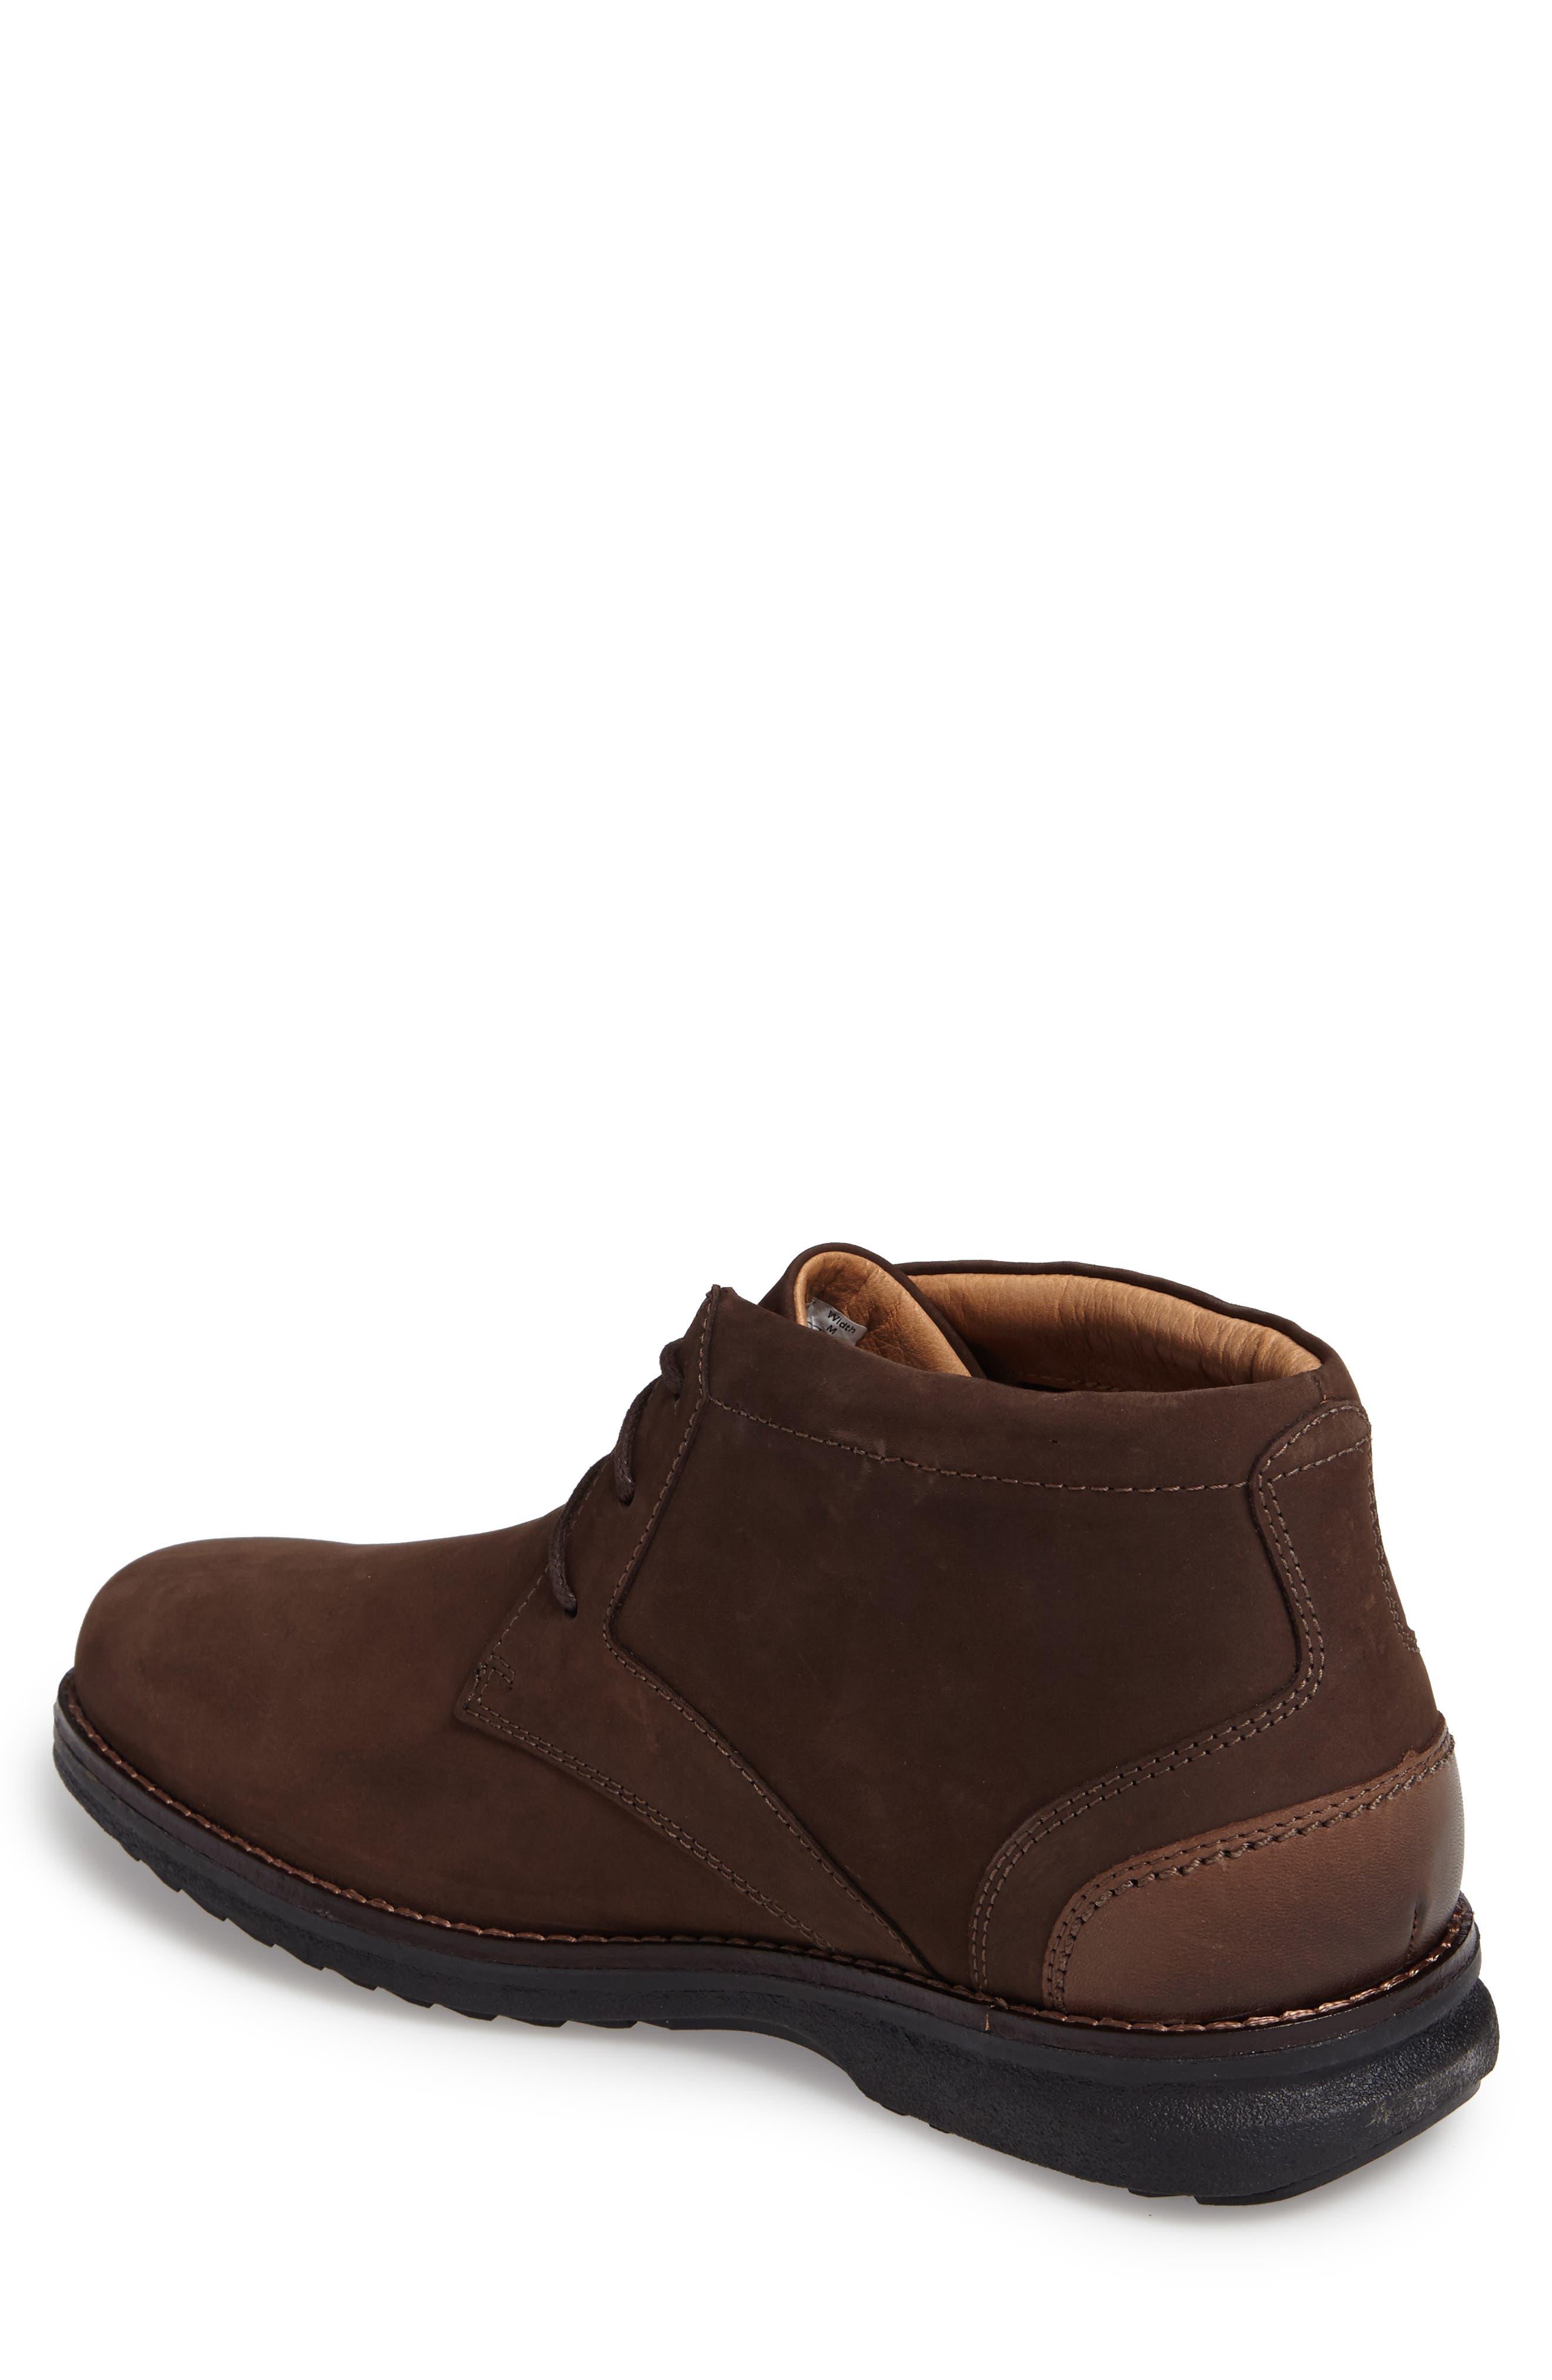 Premium Class Chukka Boot,                             Alternate thumbnail 2, color,                             Brown Nubuck